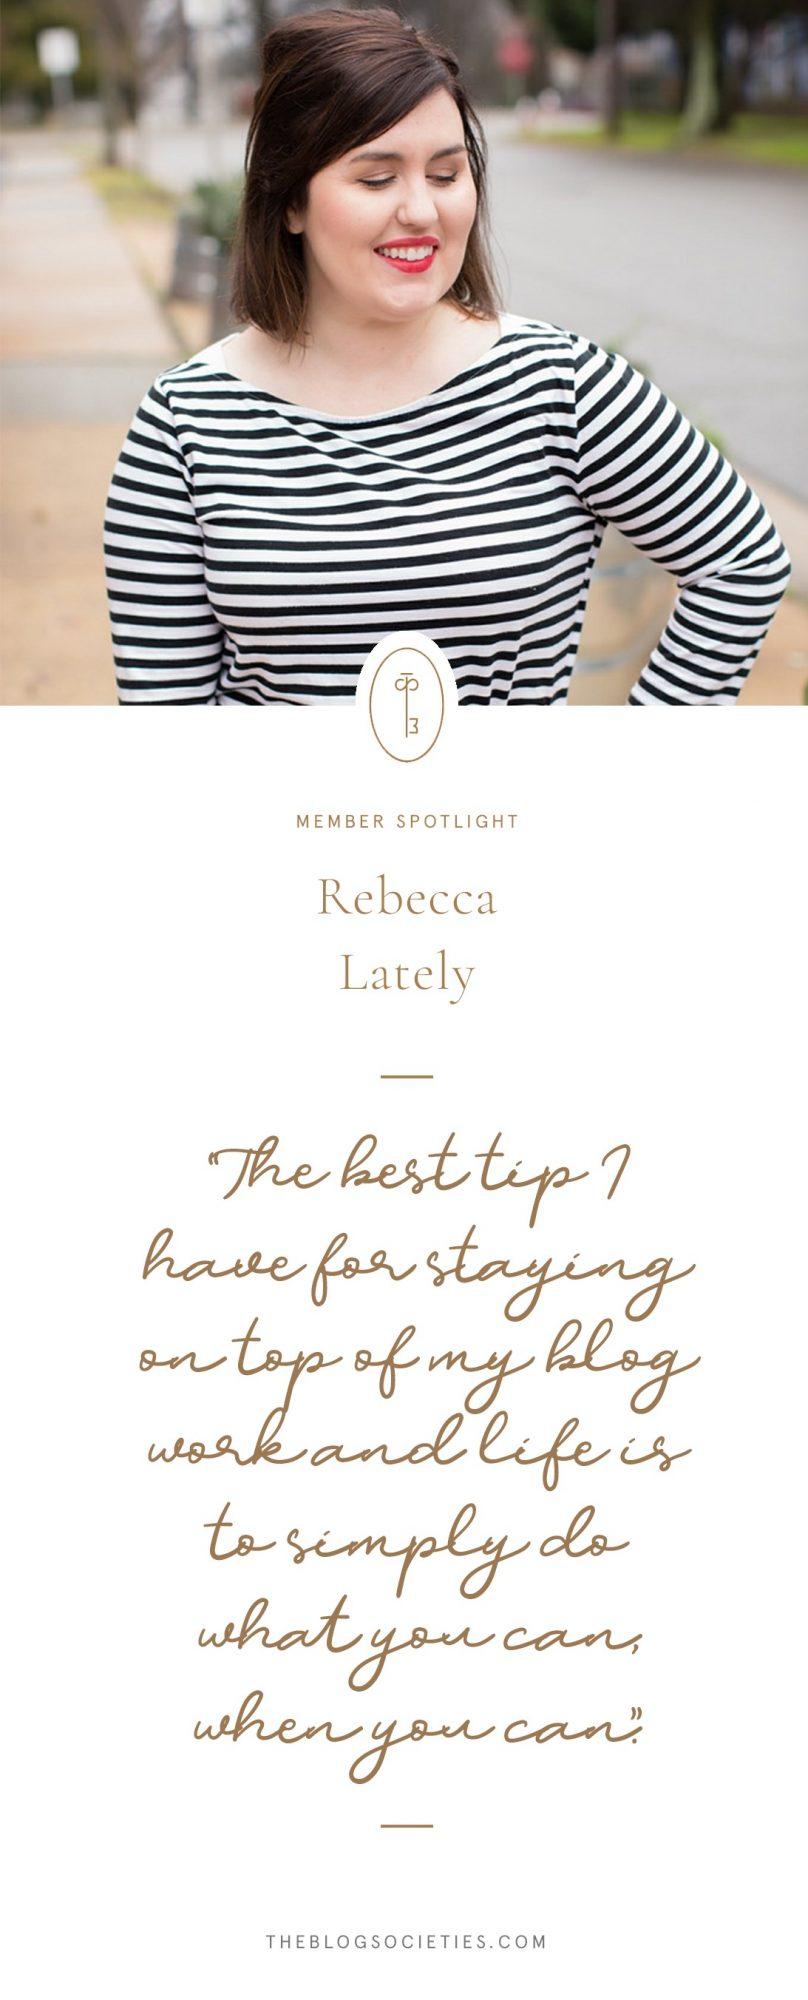 Rebecca of Rebecca Lately